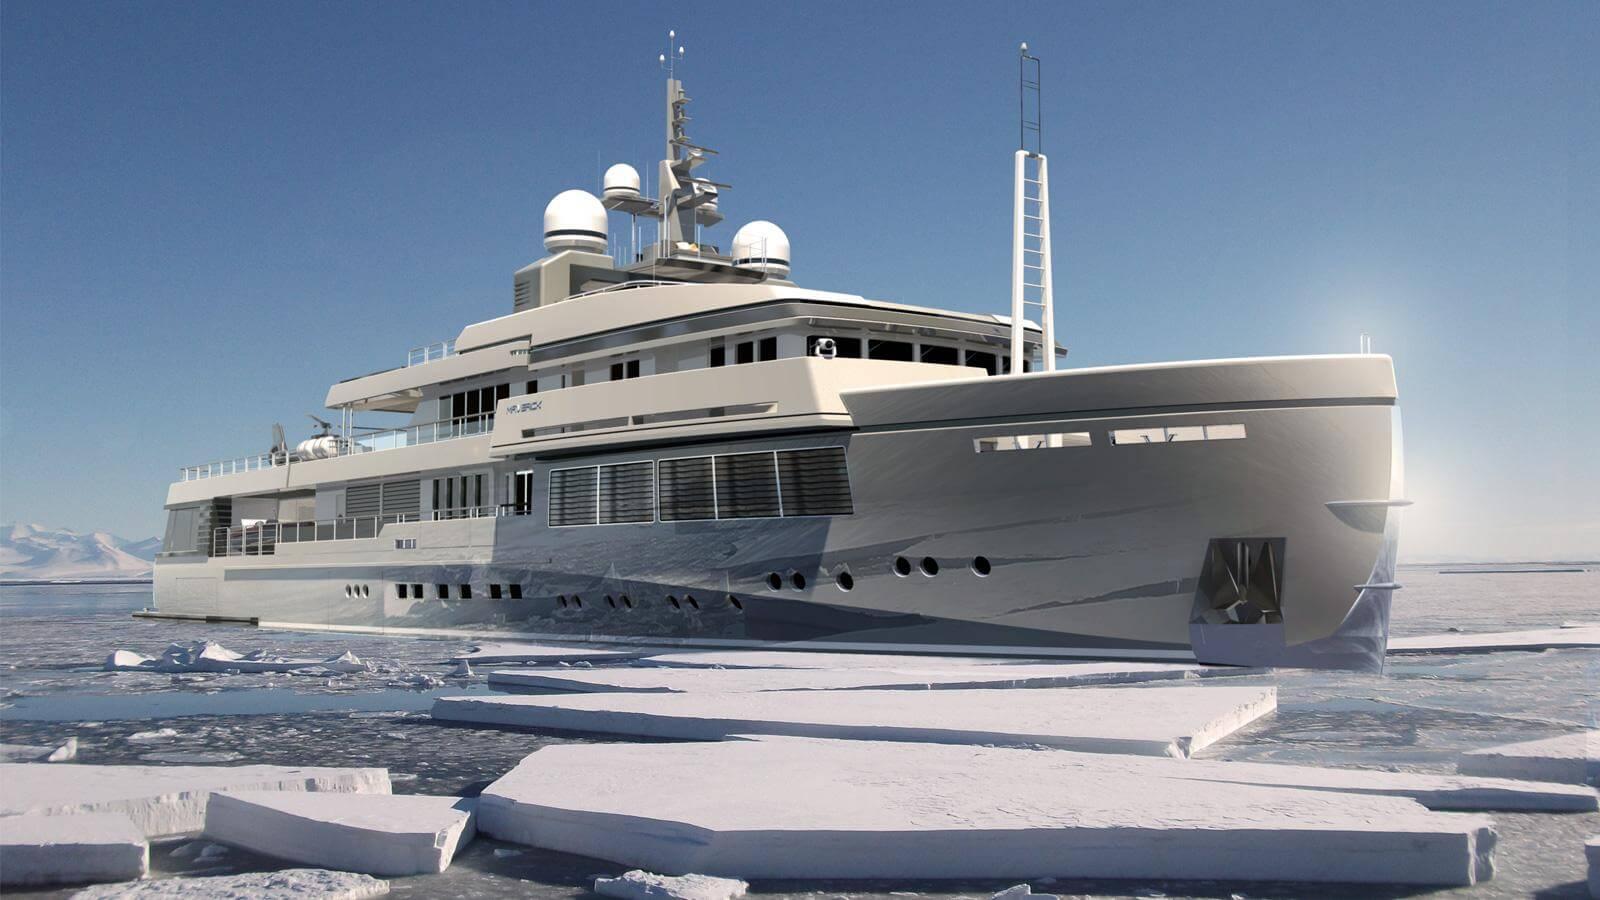 Rossinavi Explorer Yacht Concept Maverick 55 Paolo Nari Design